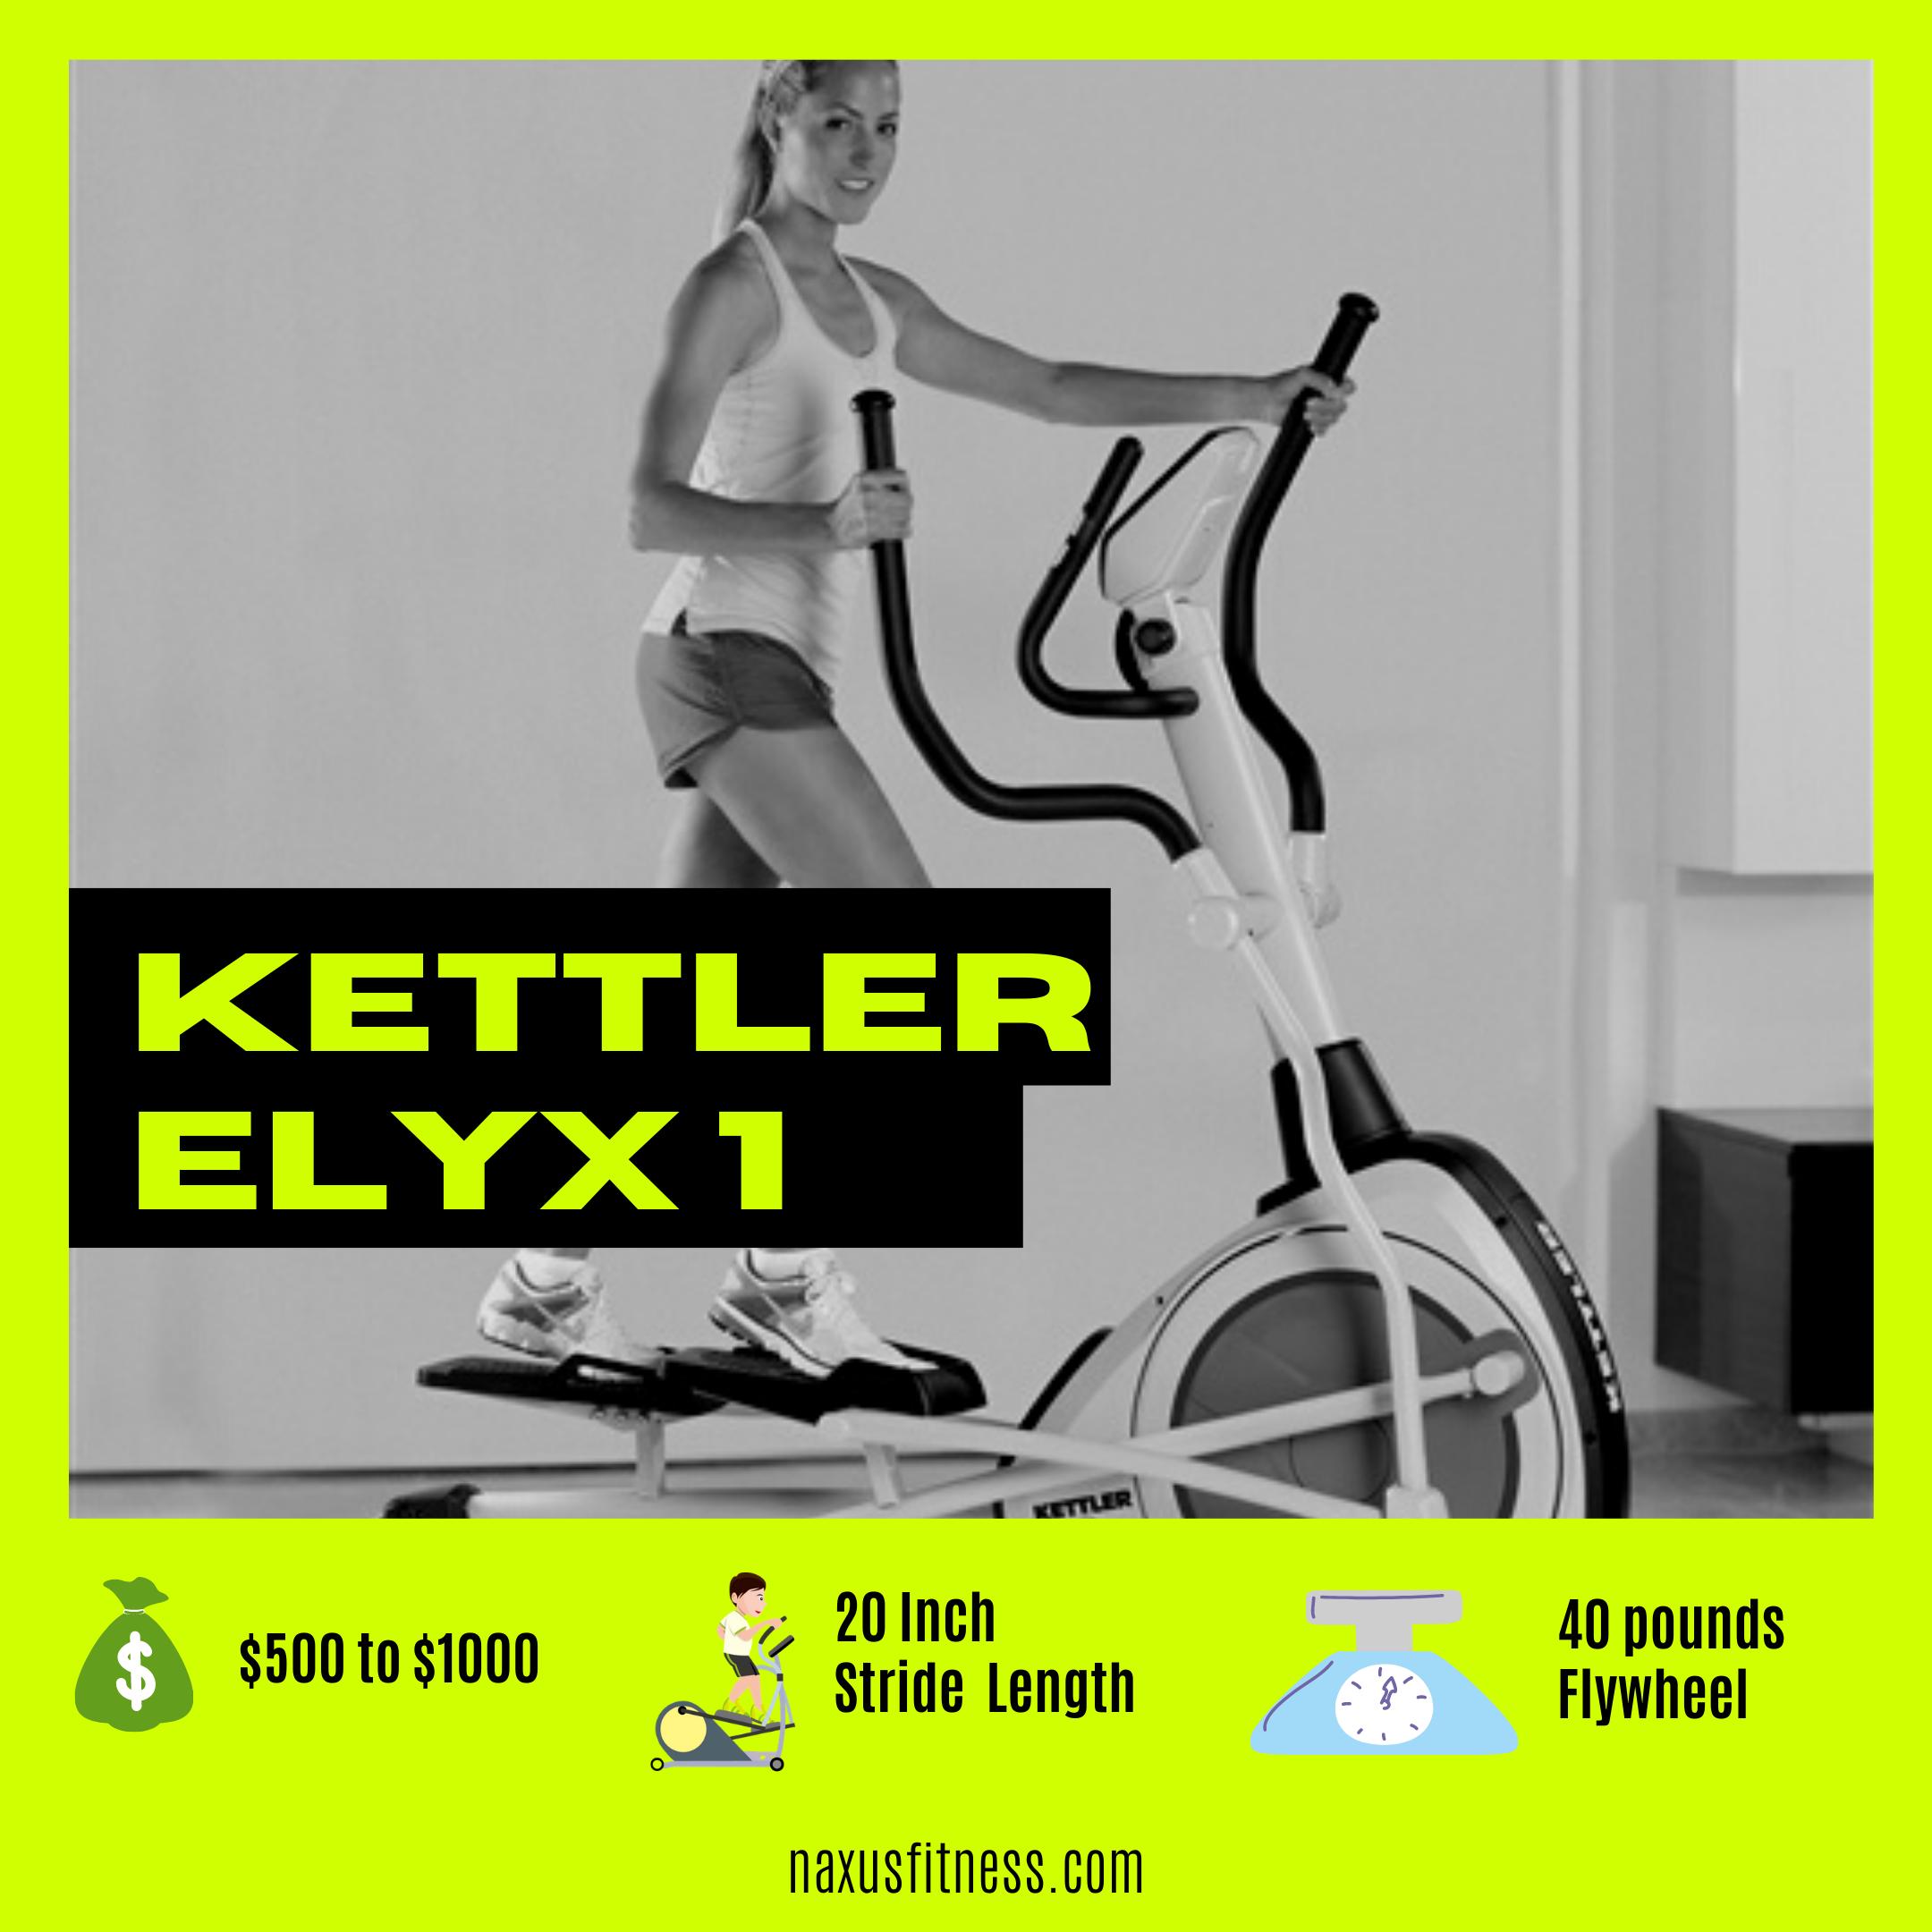 Kettler Elyx 1 Elliptical Review